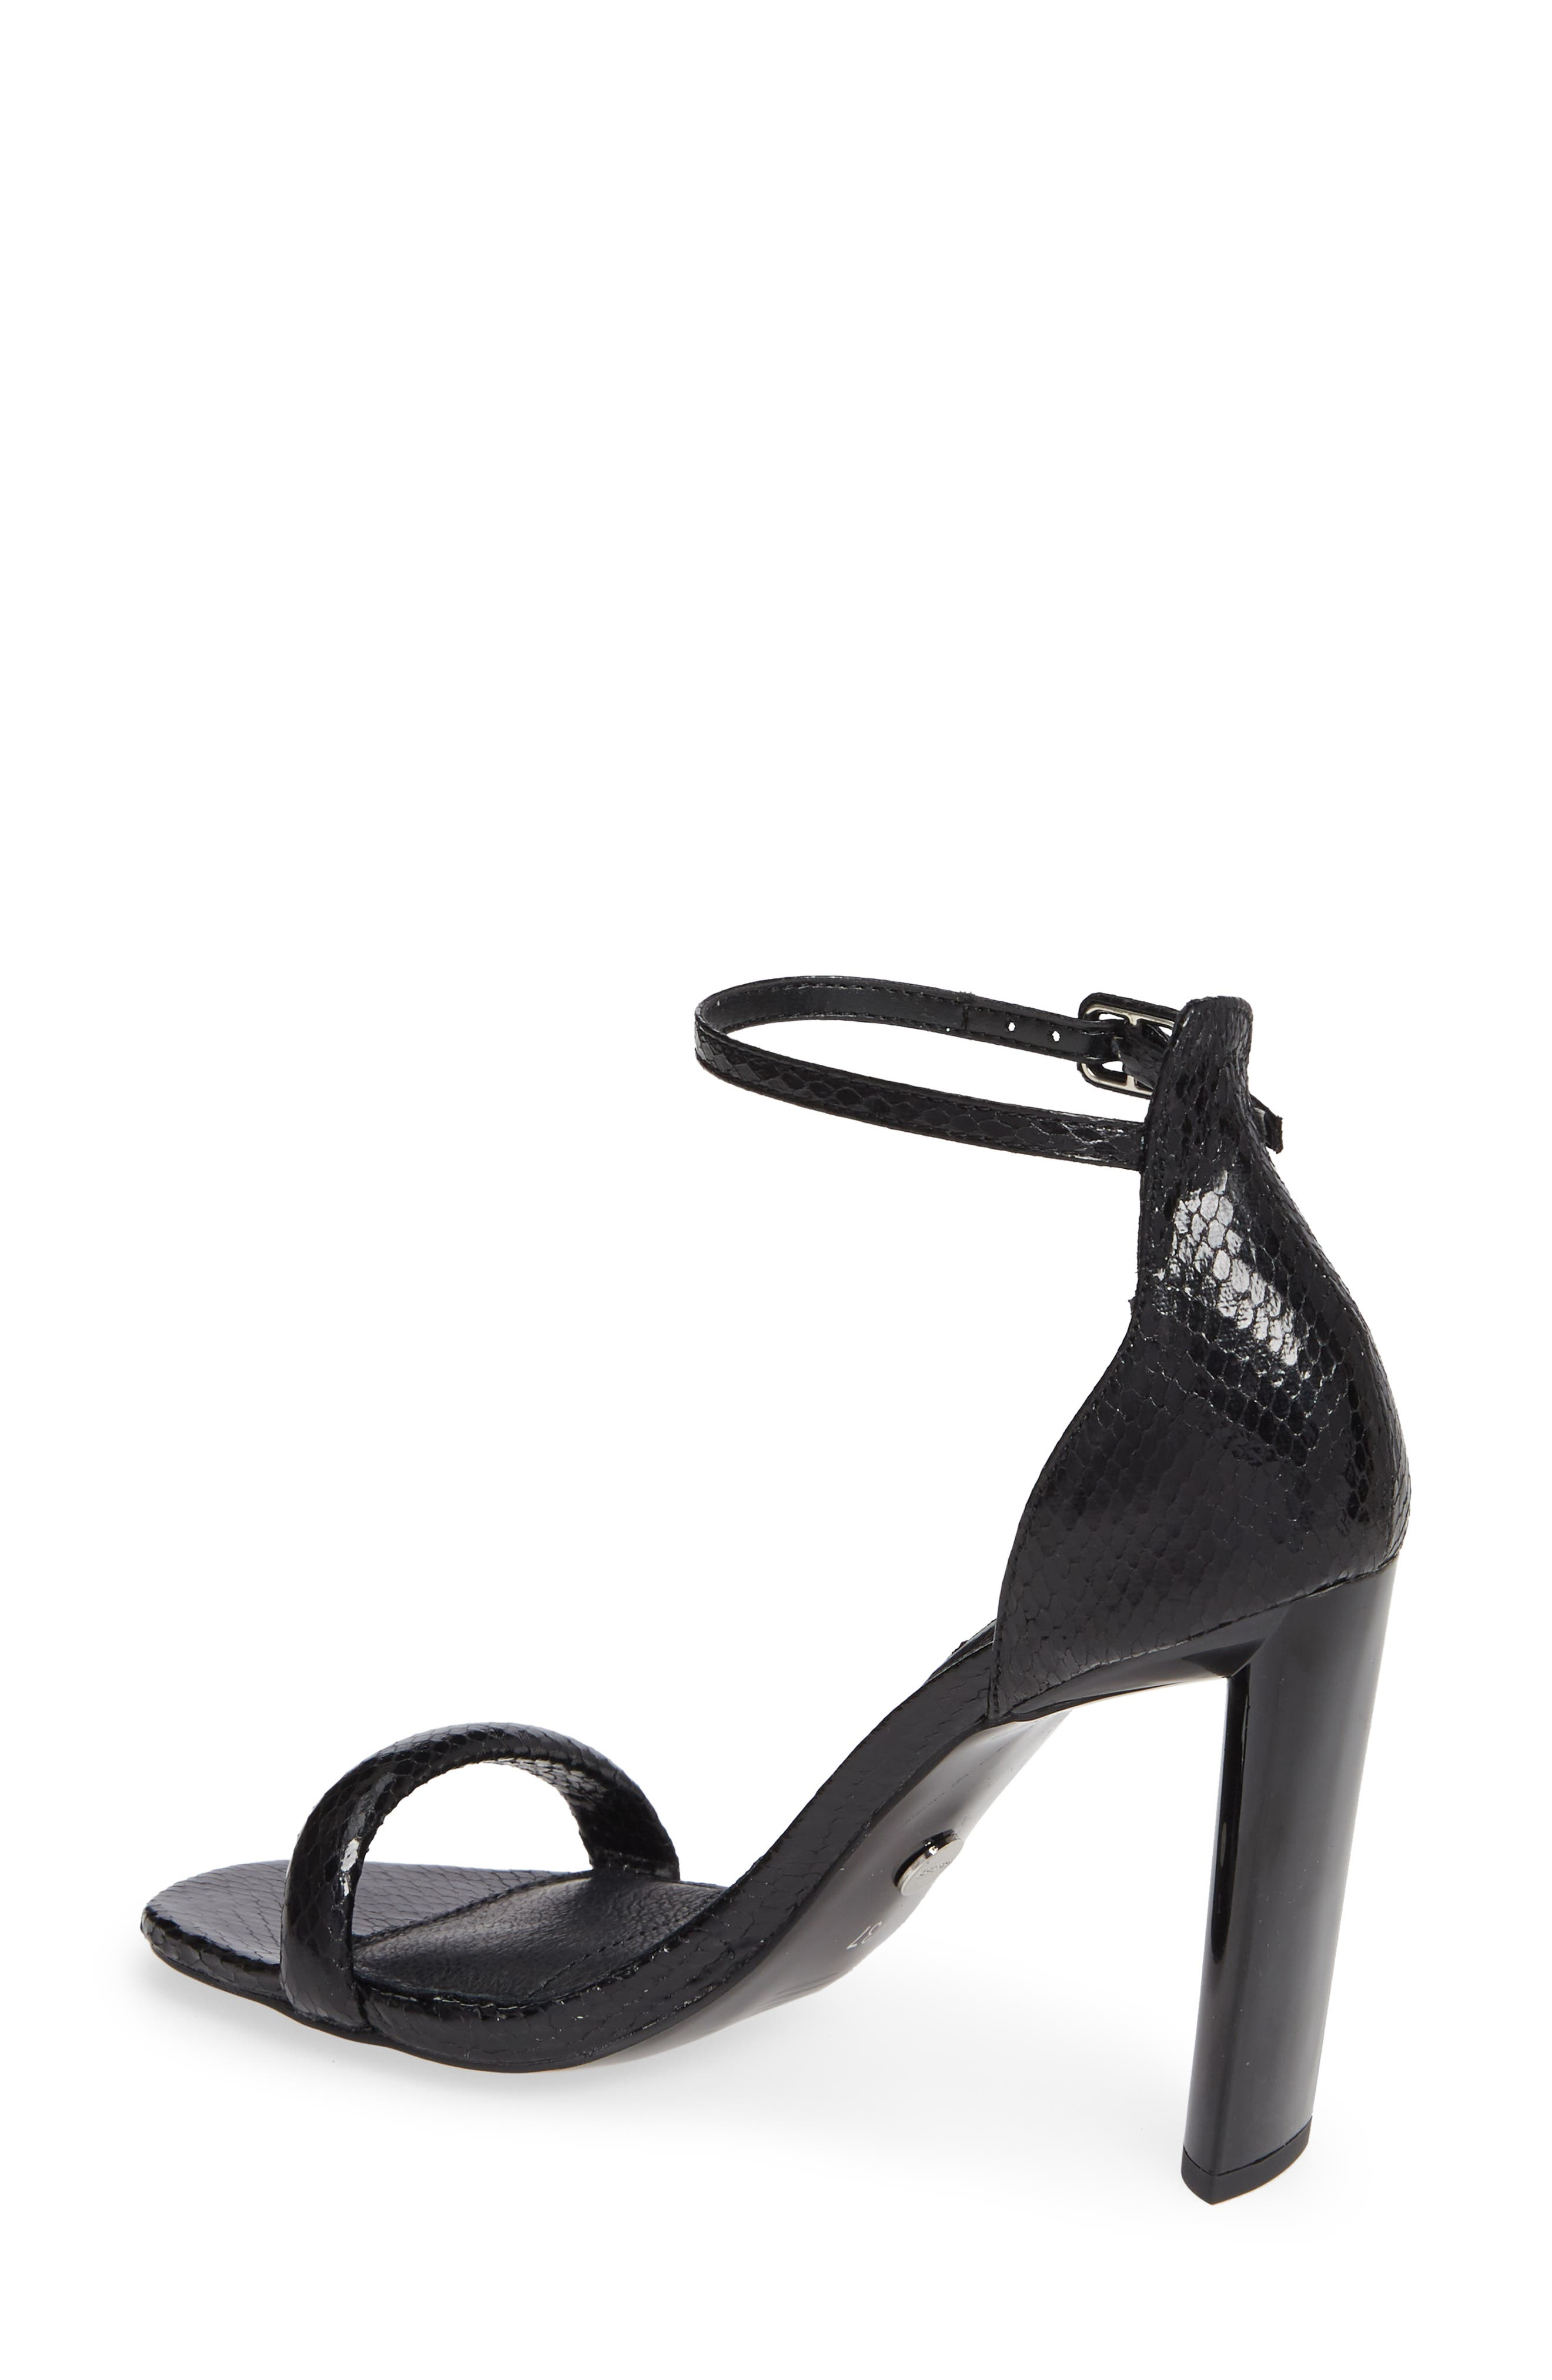 TOPSHOP, Robyn Ankle Strap Sandal, Alternate thumbnail 2, color, BLACK